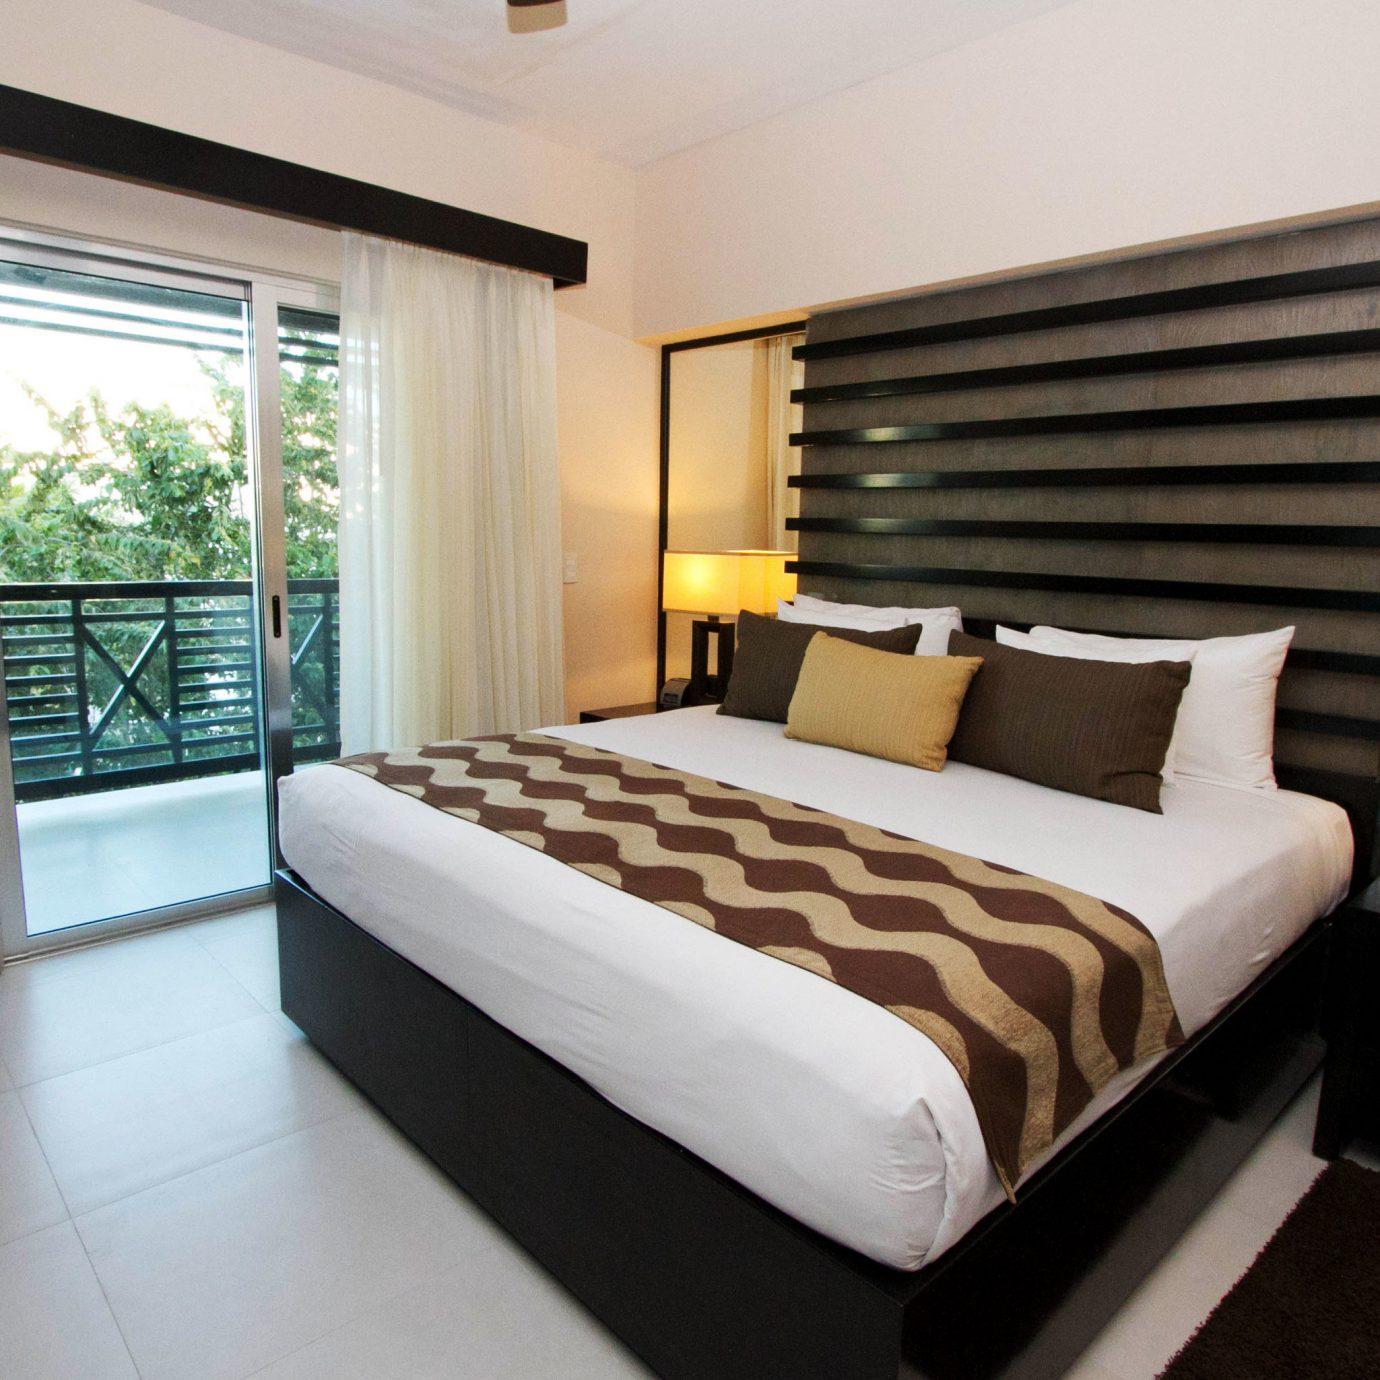 sofa Bedroom property Suite pillow condominium cottage bed sheet